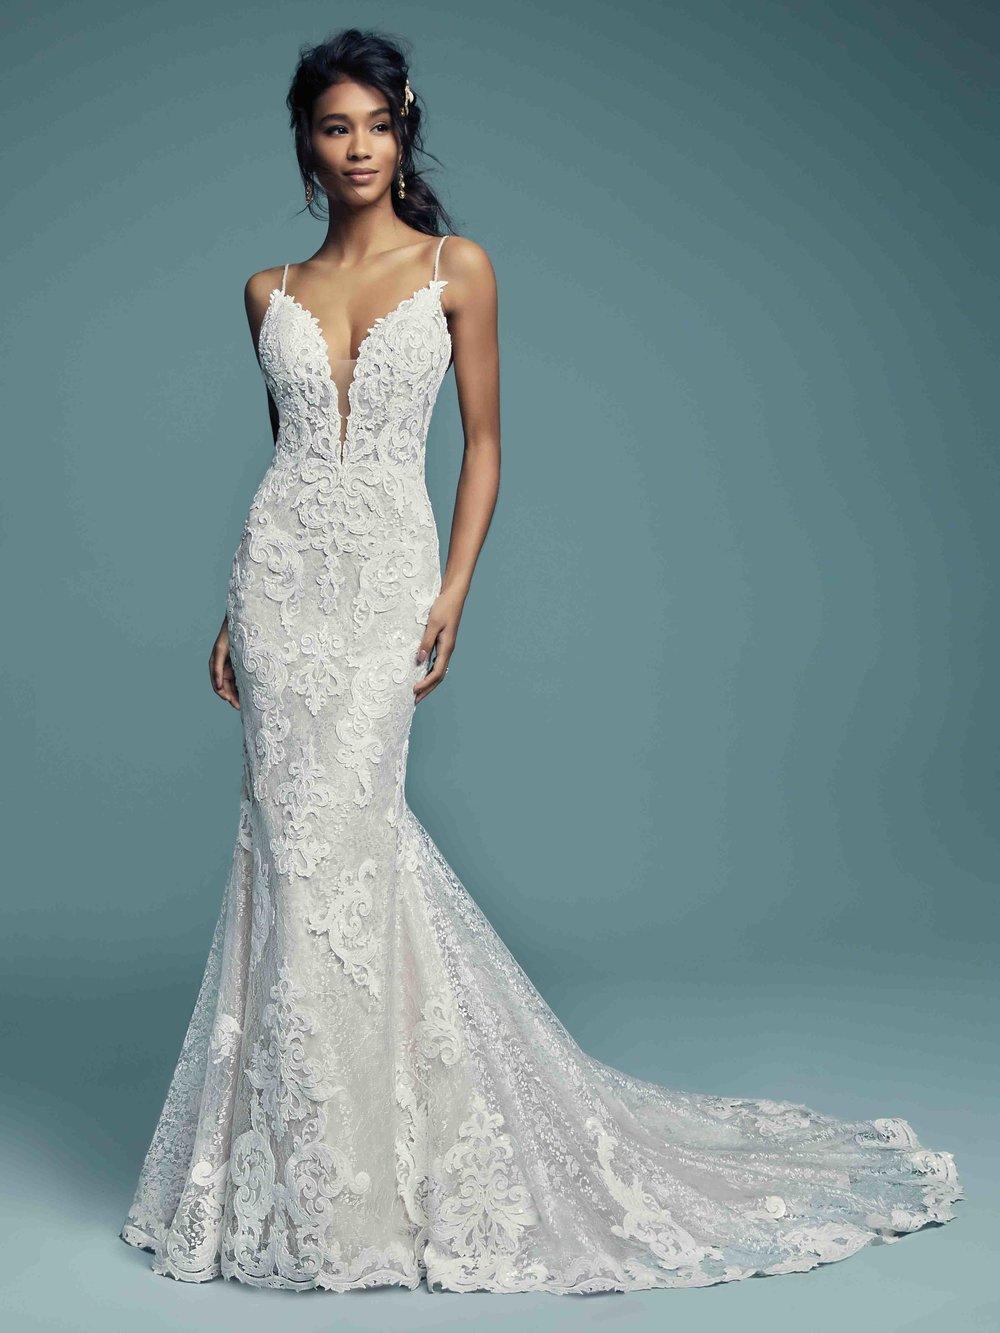 Tuscany Lynette Abbey Bridal Australia S Best Leading Wedding